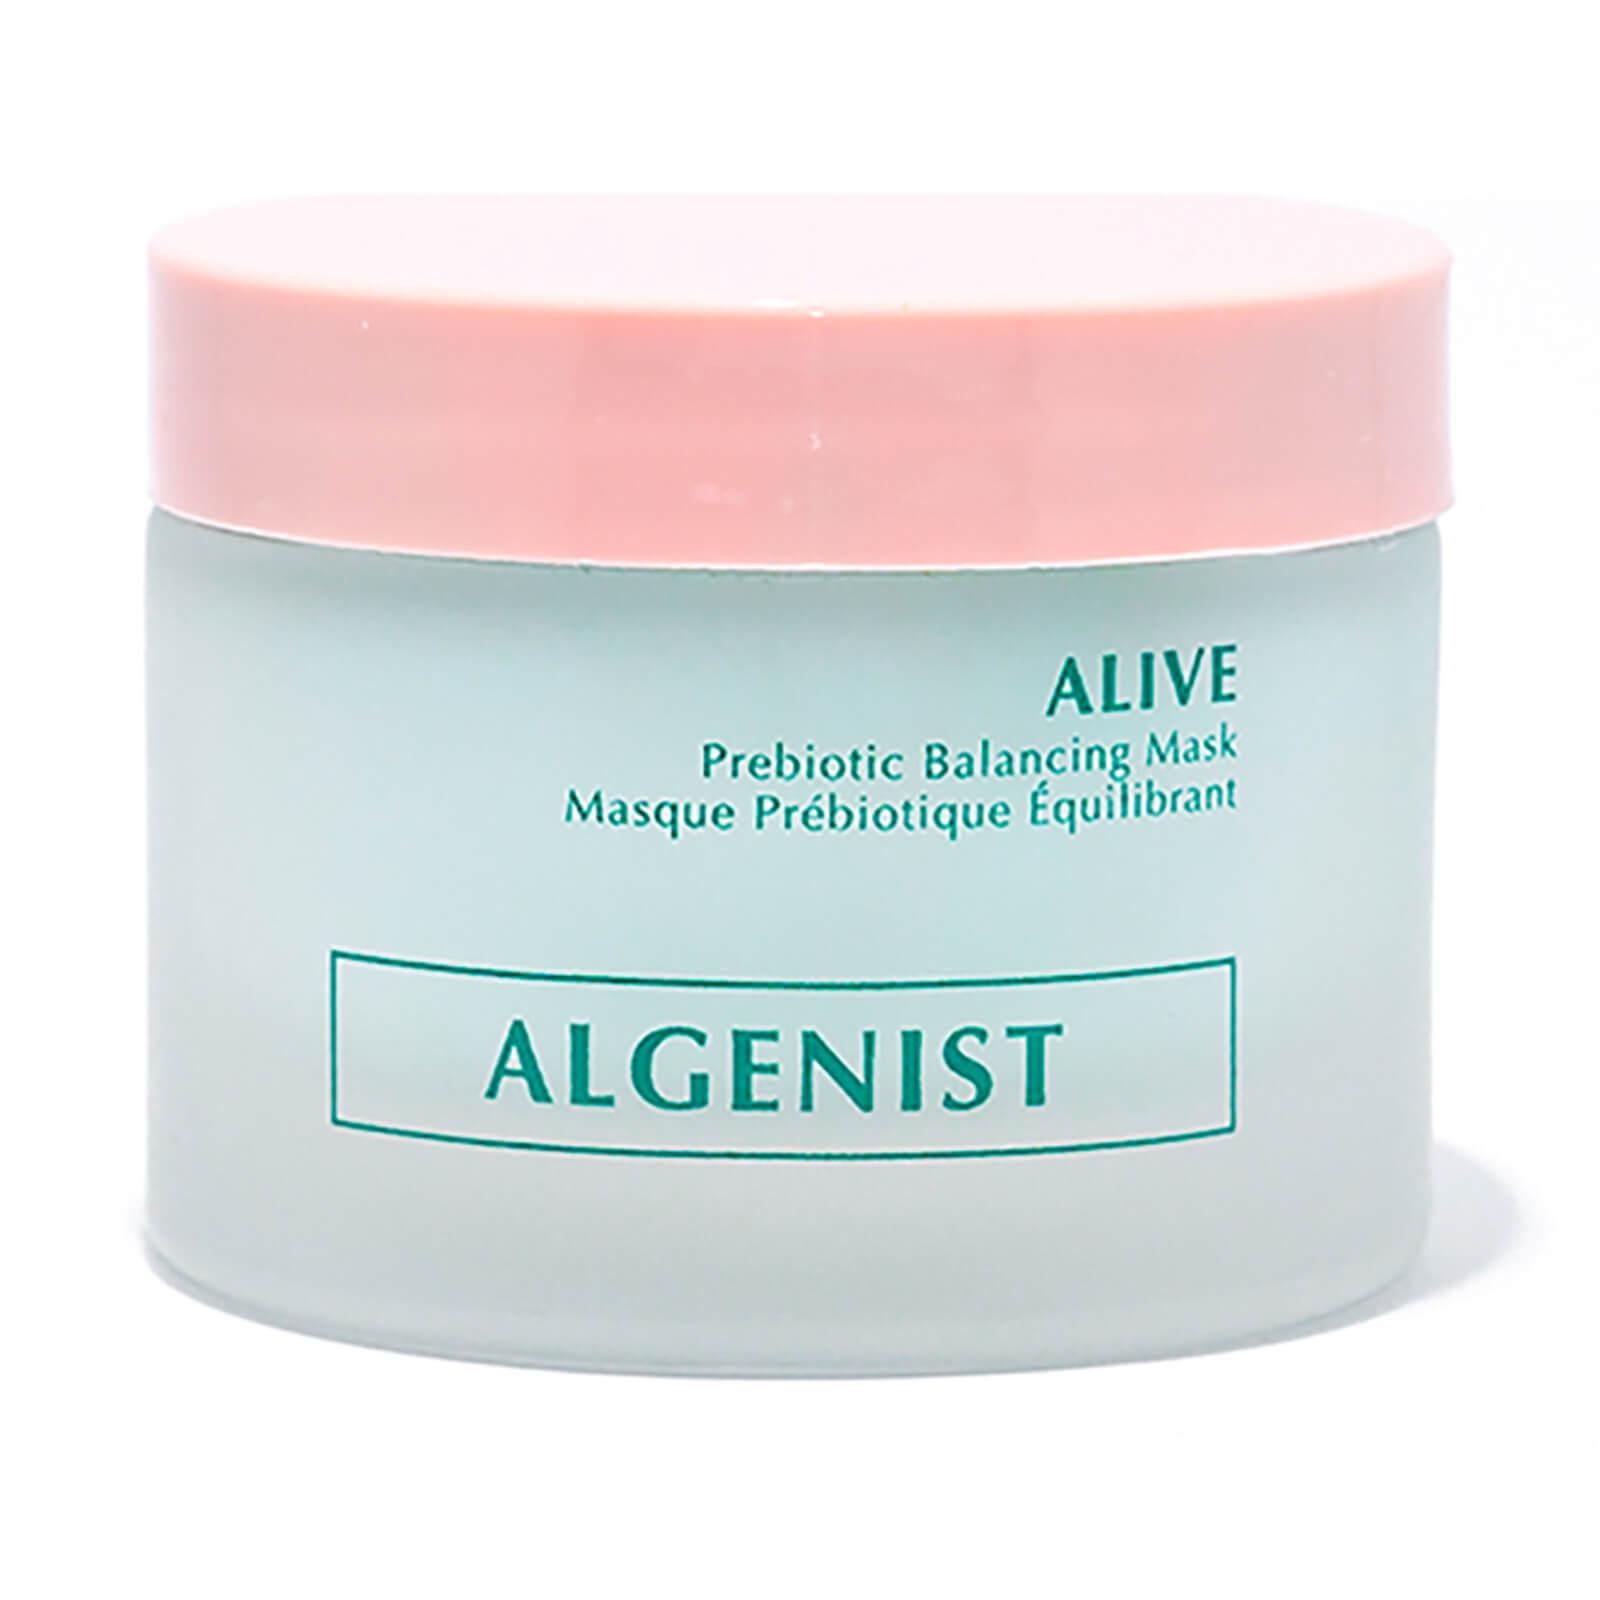 algenist alive prebiotic balancing mask 50ml